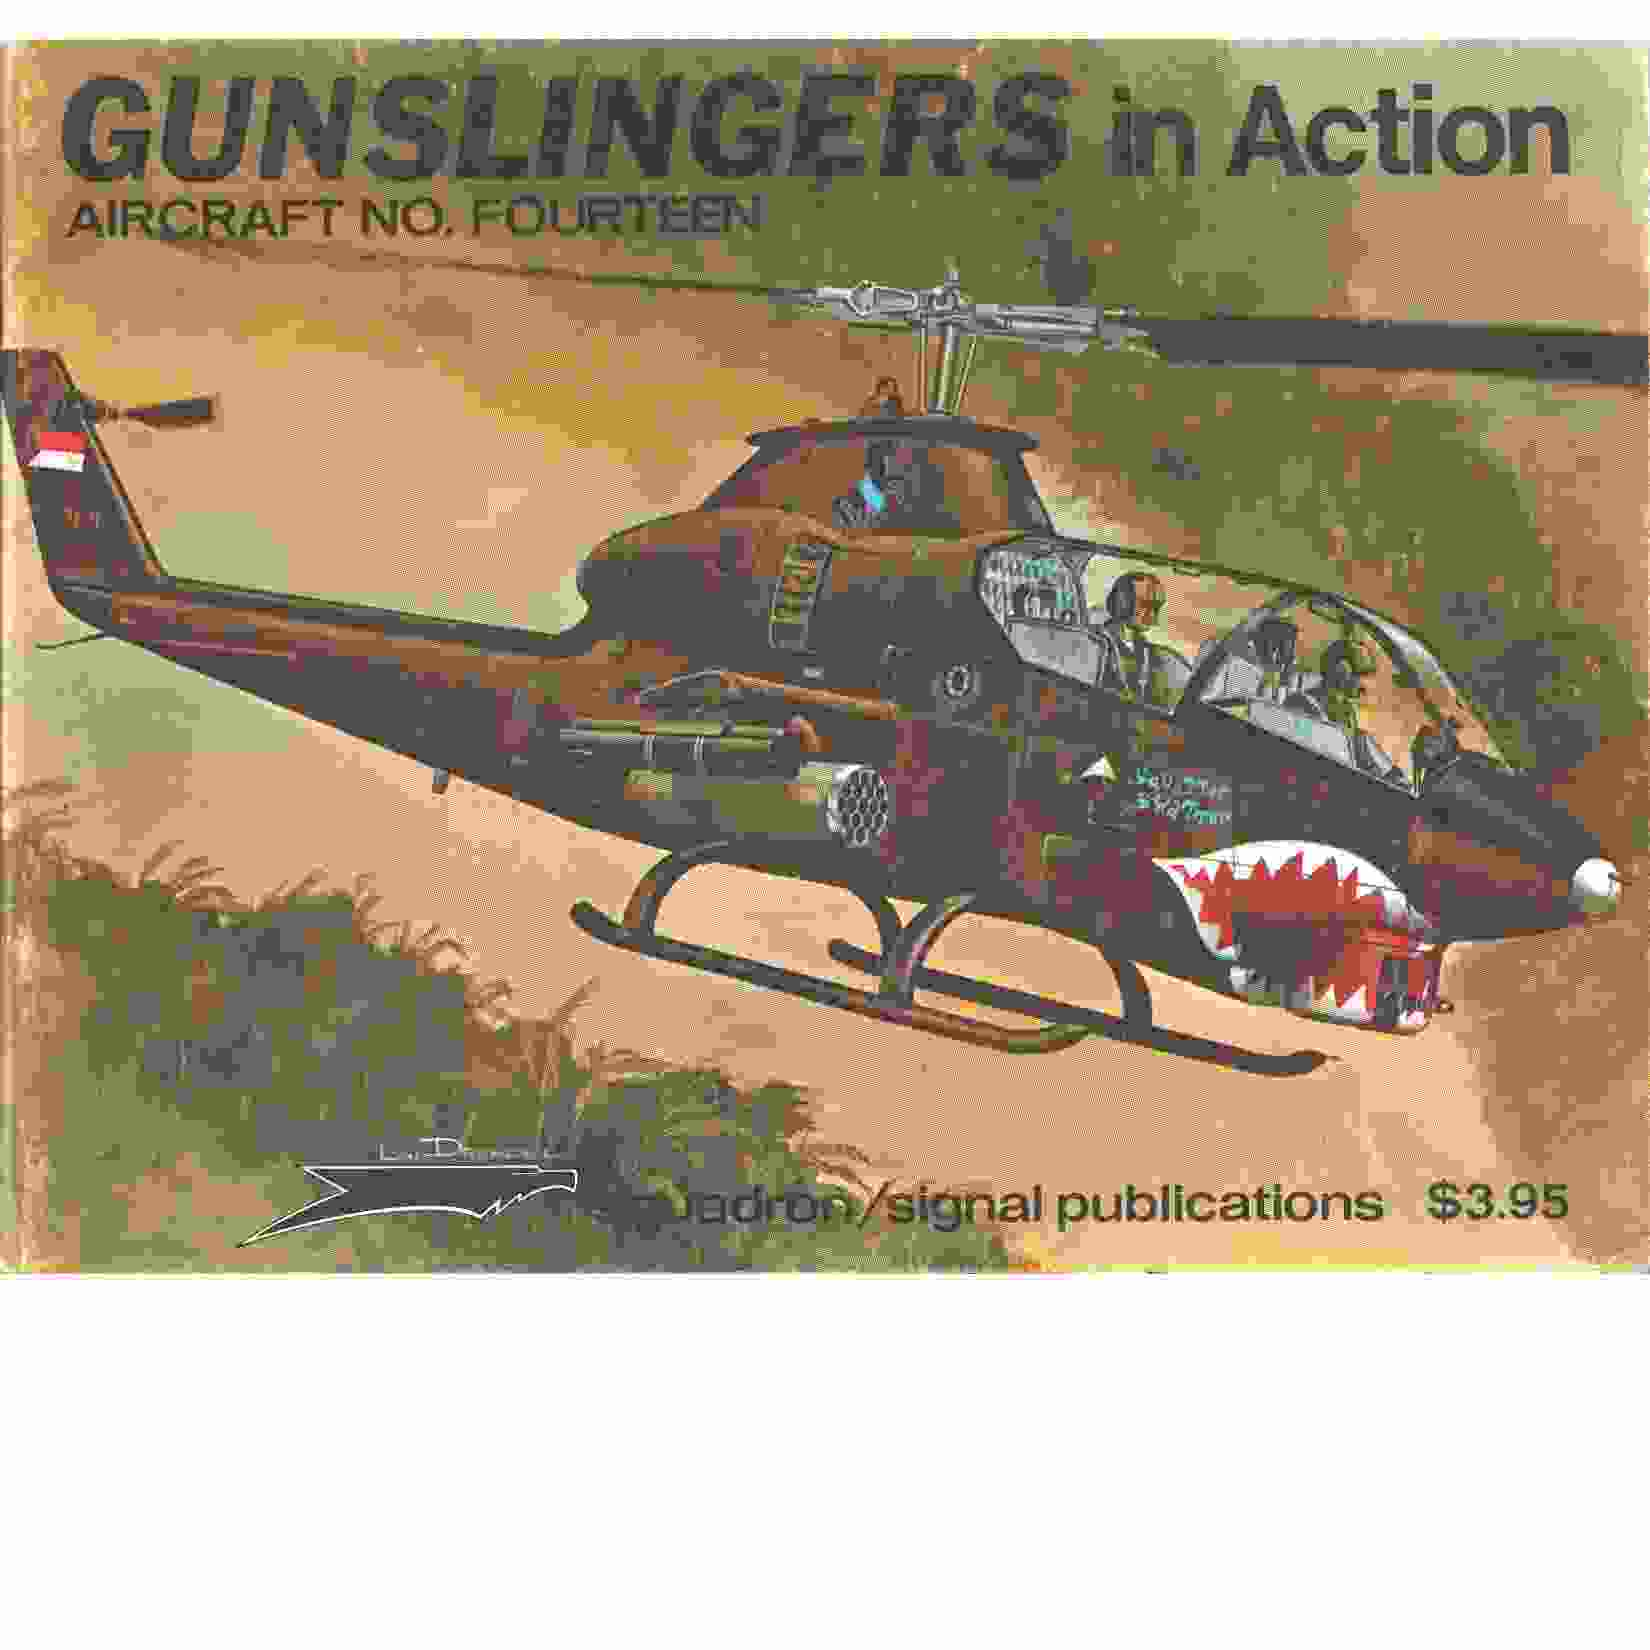 Gunslingers in action - Aircraft No. 14 - Drendel, Lou